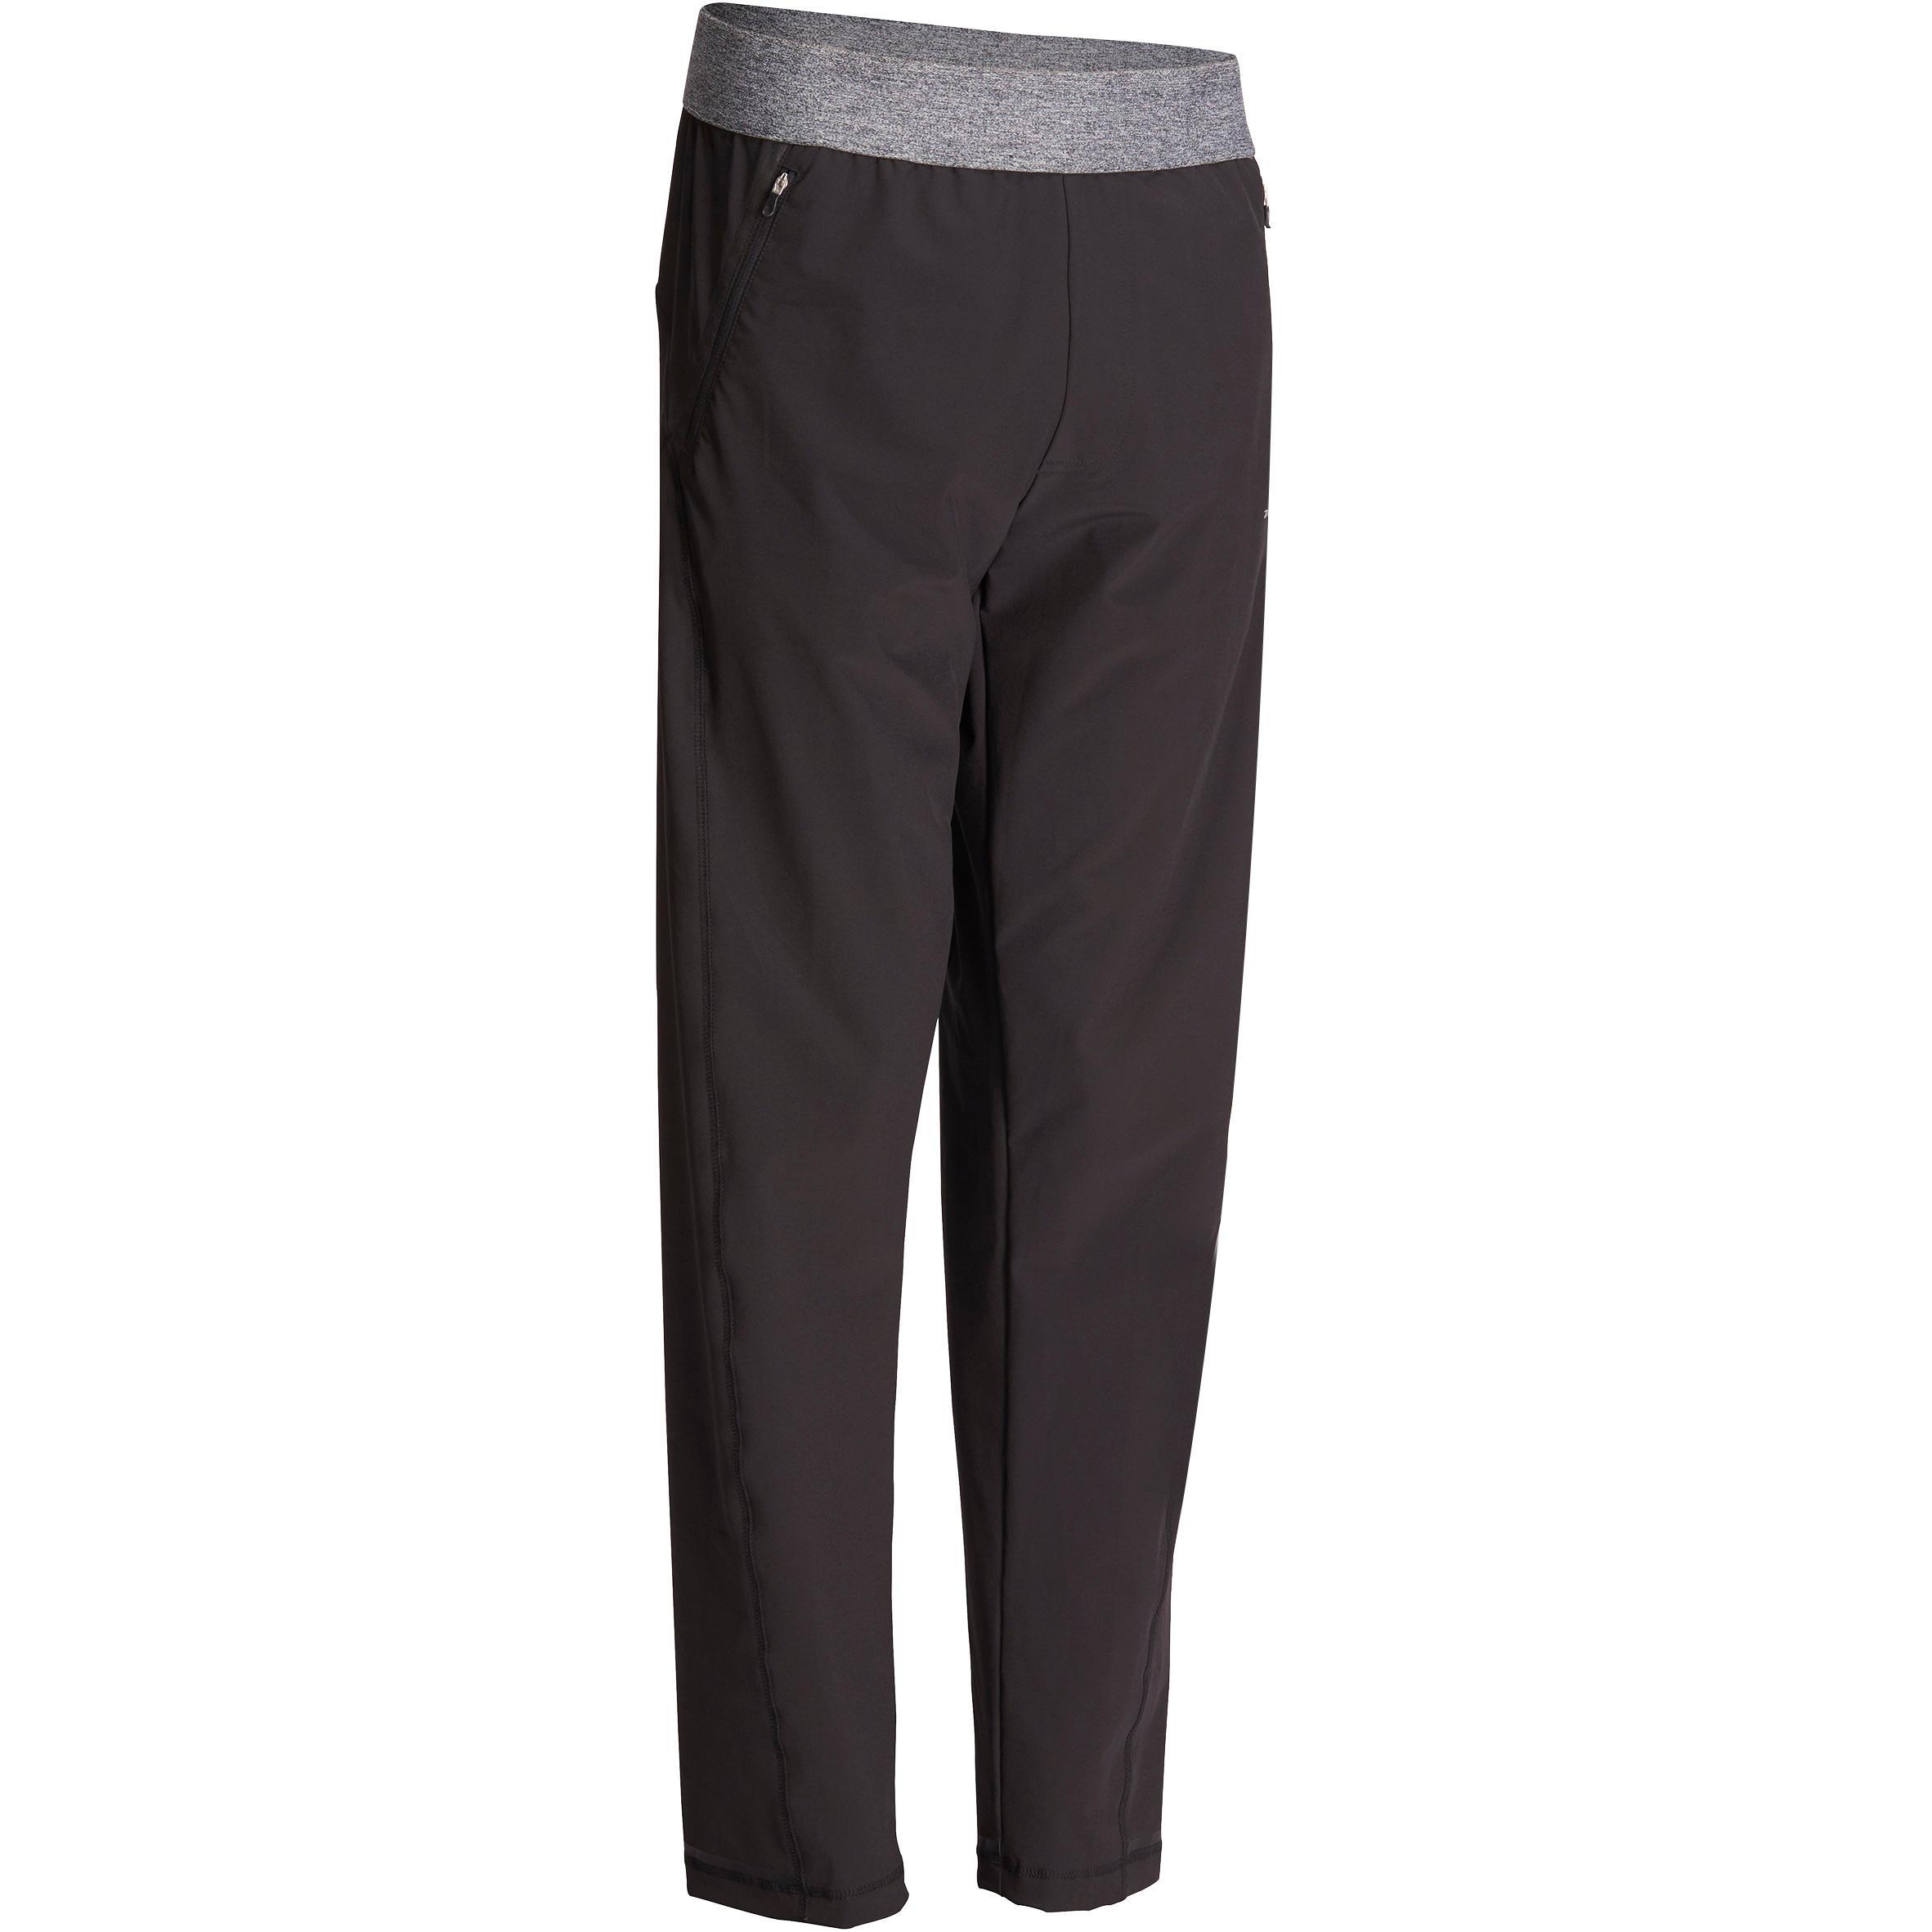 Pantalon toile YOGA homme noir